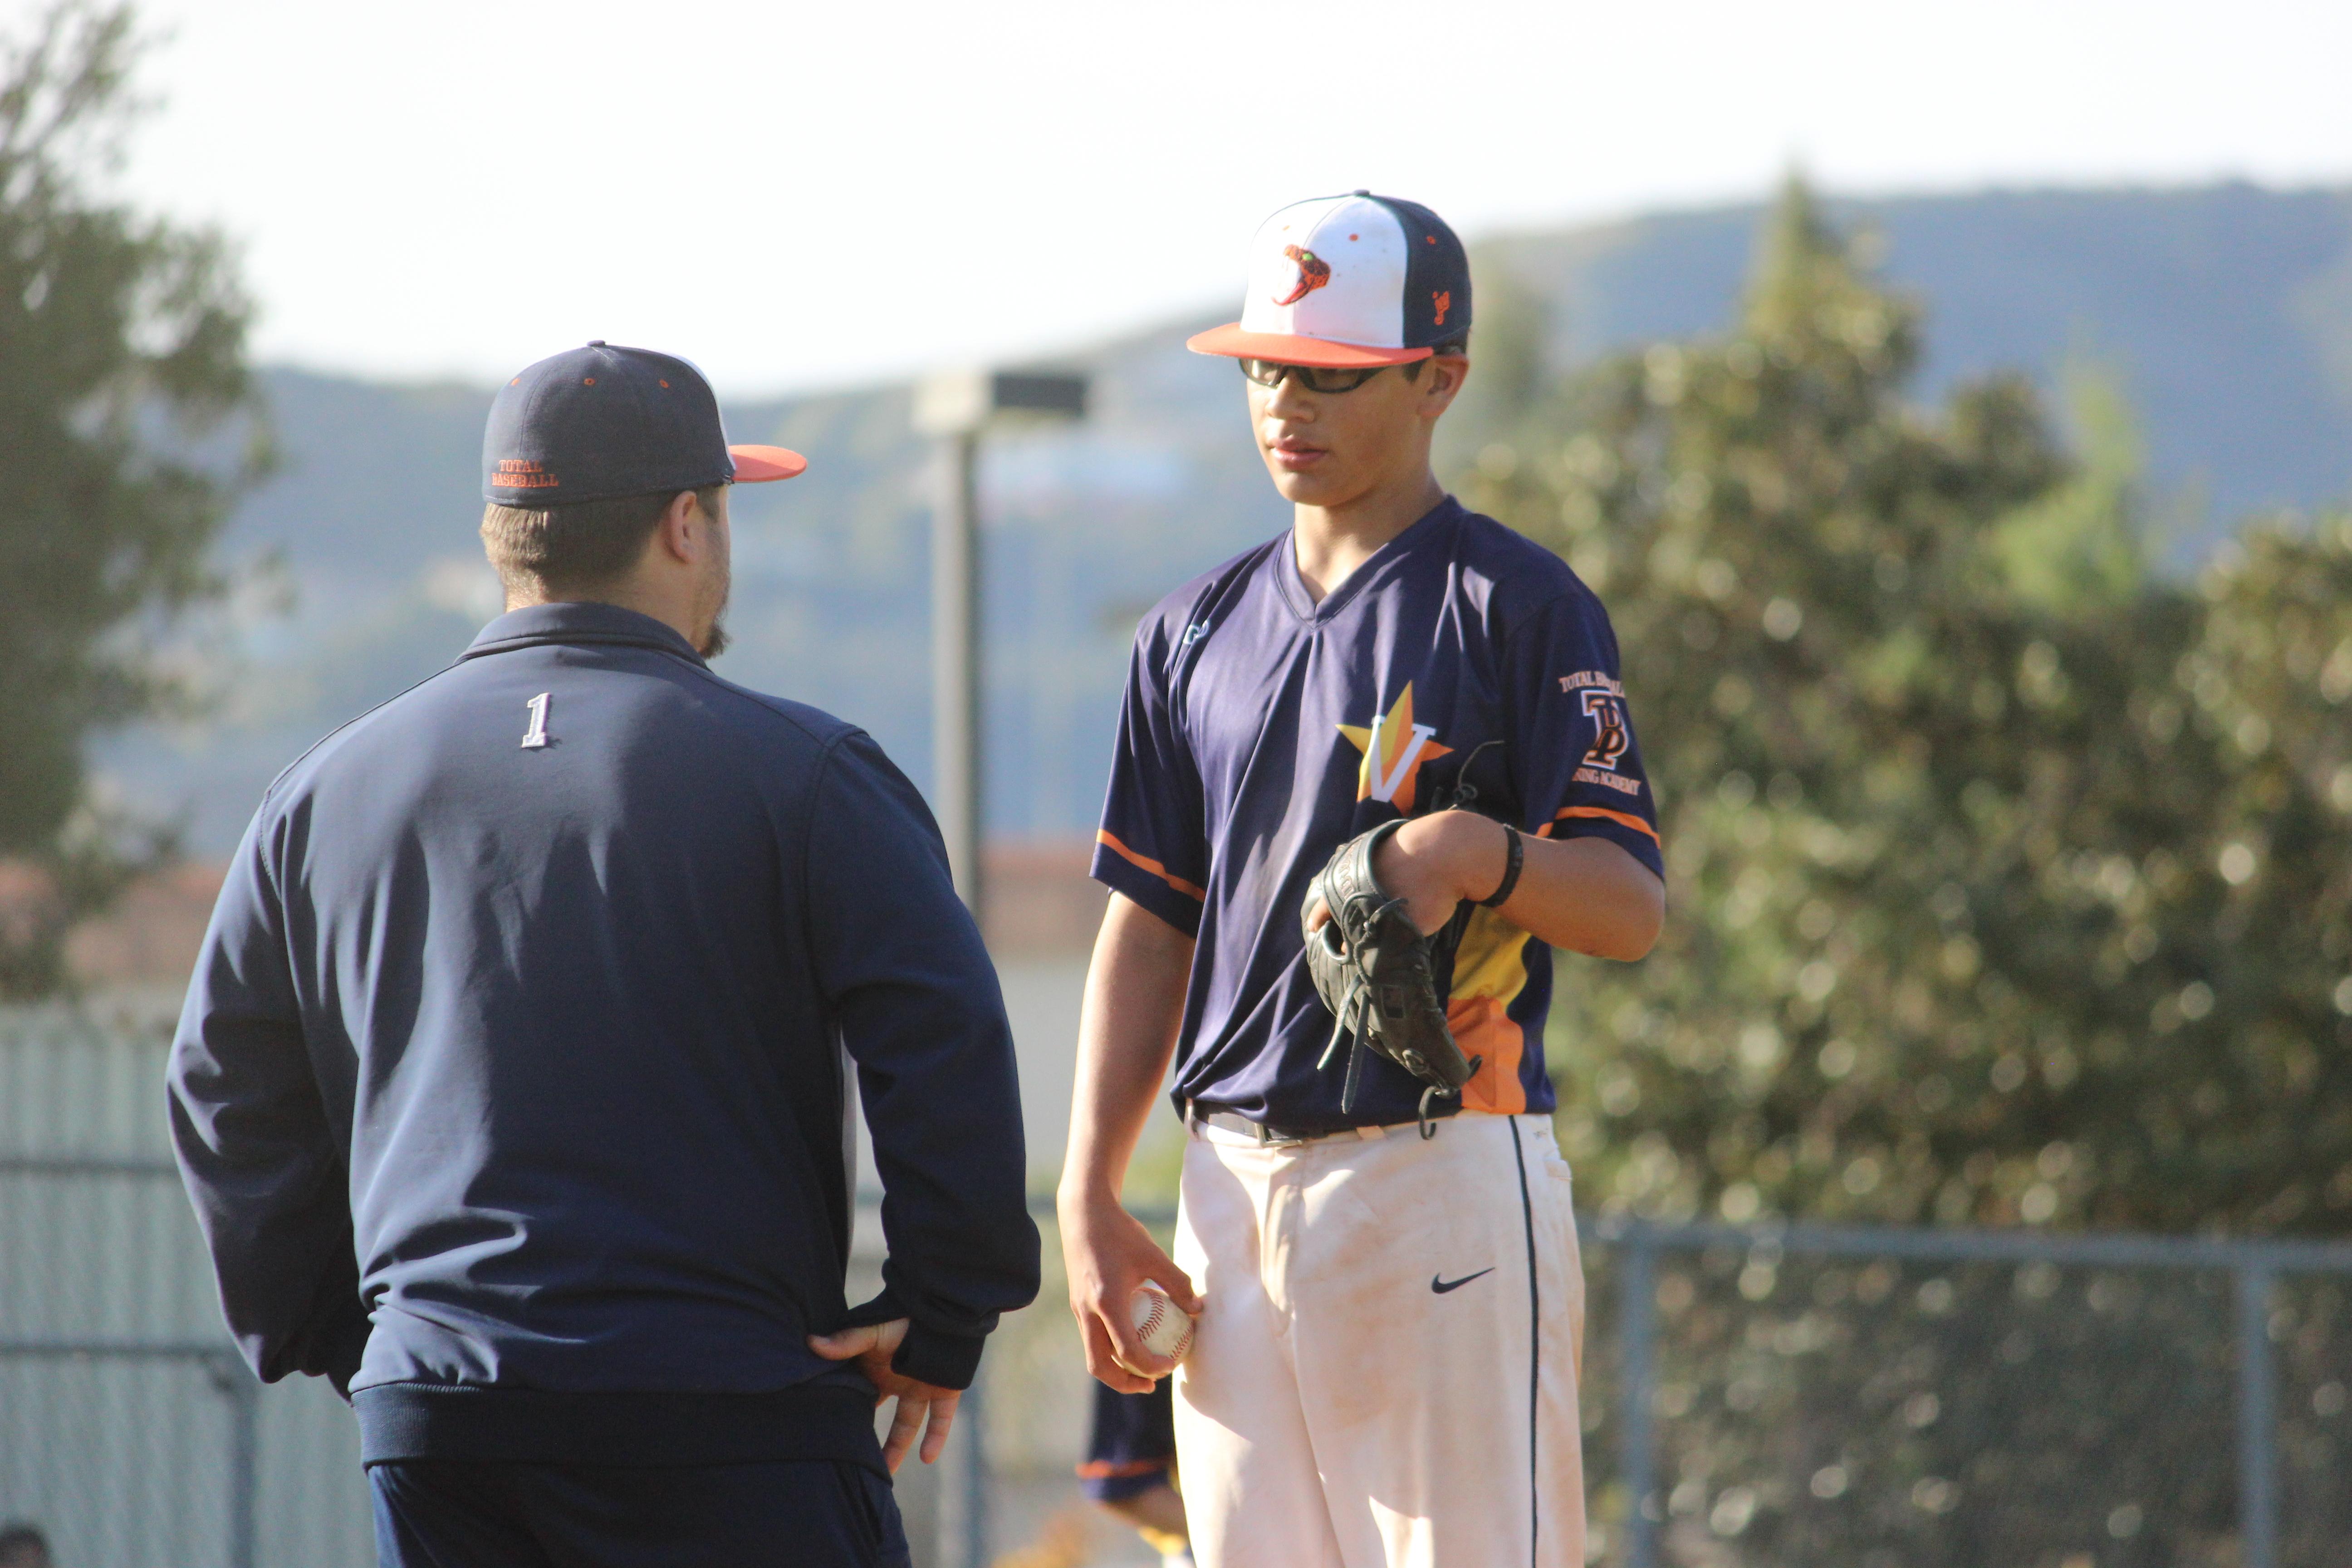 coach and taller baseball player